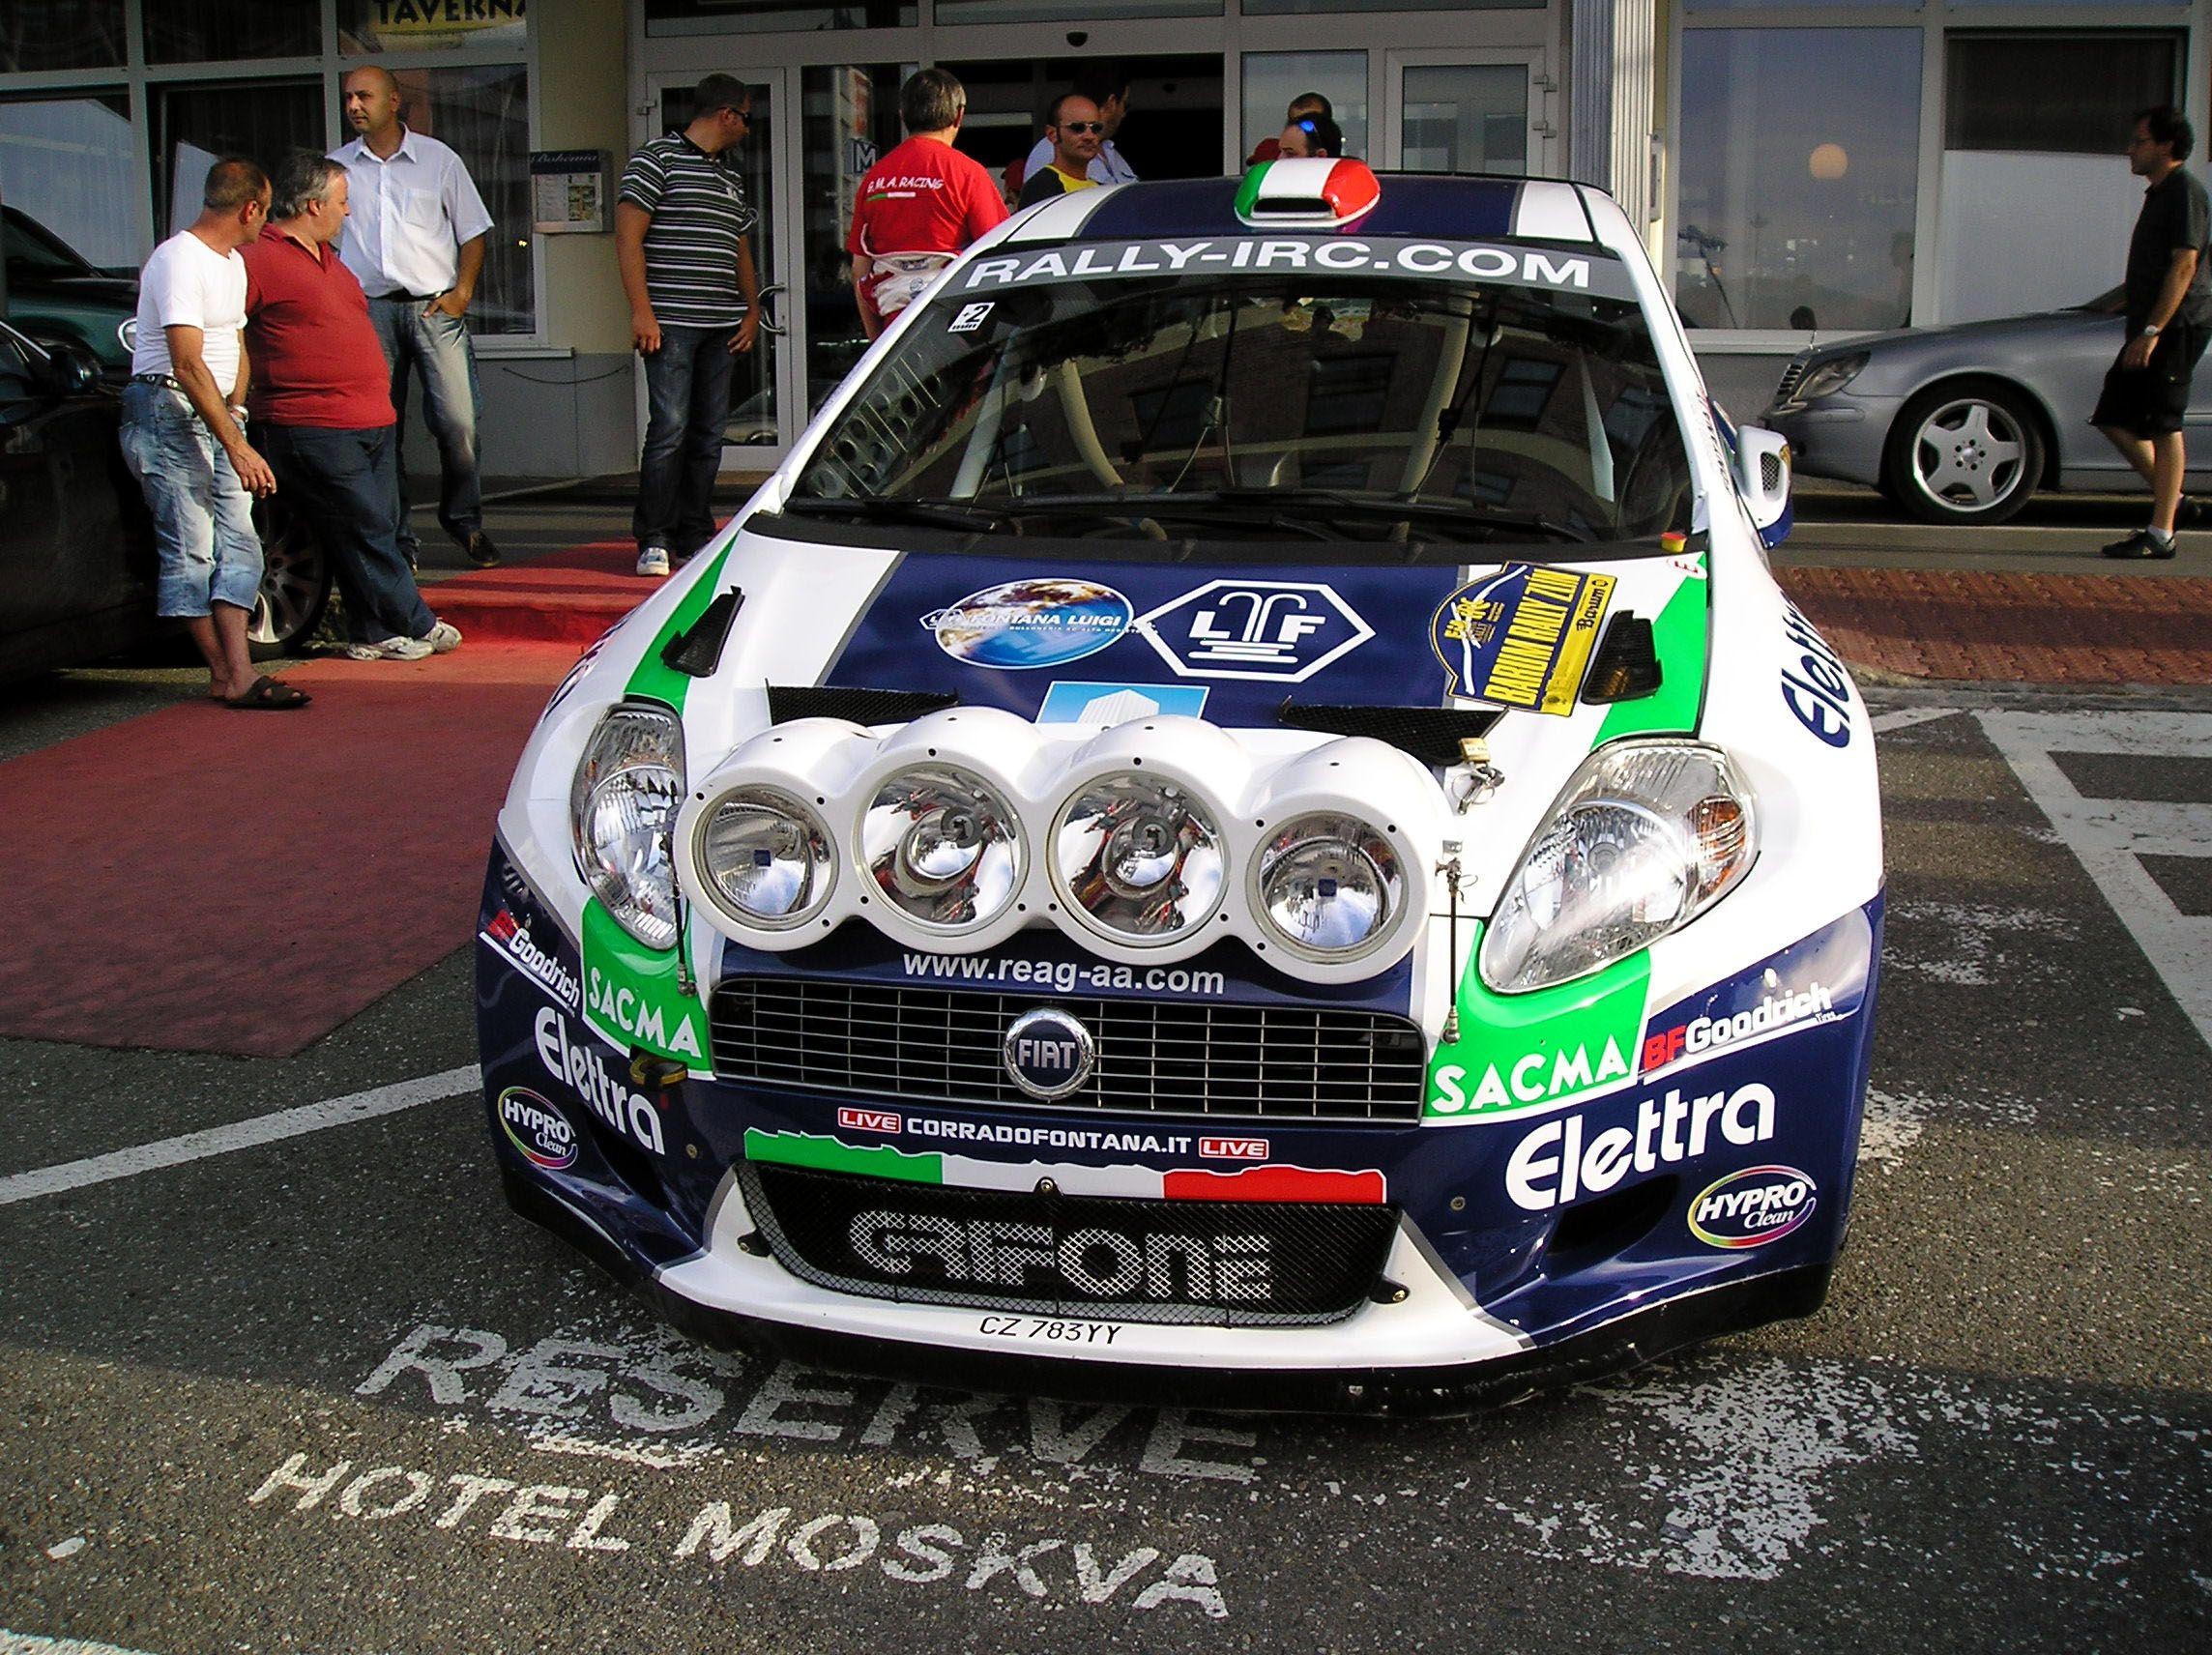 fiat grande punto abarth s2000 | motorsport | pinterest | fiat